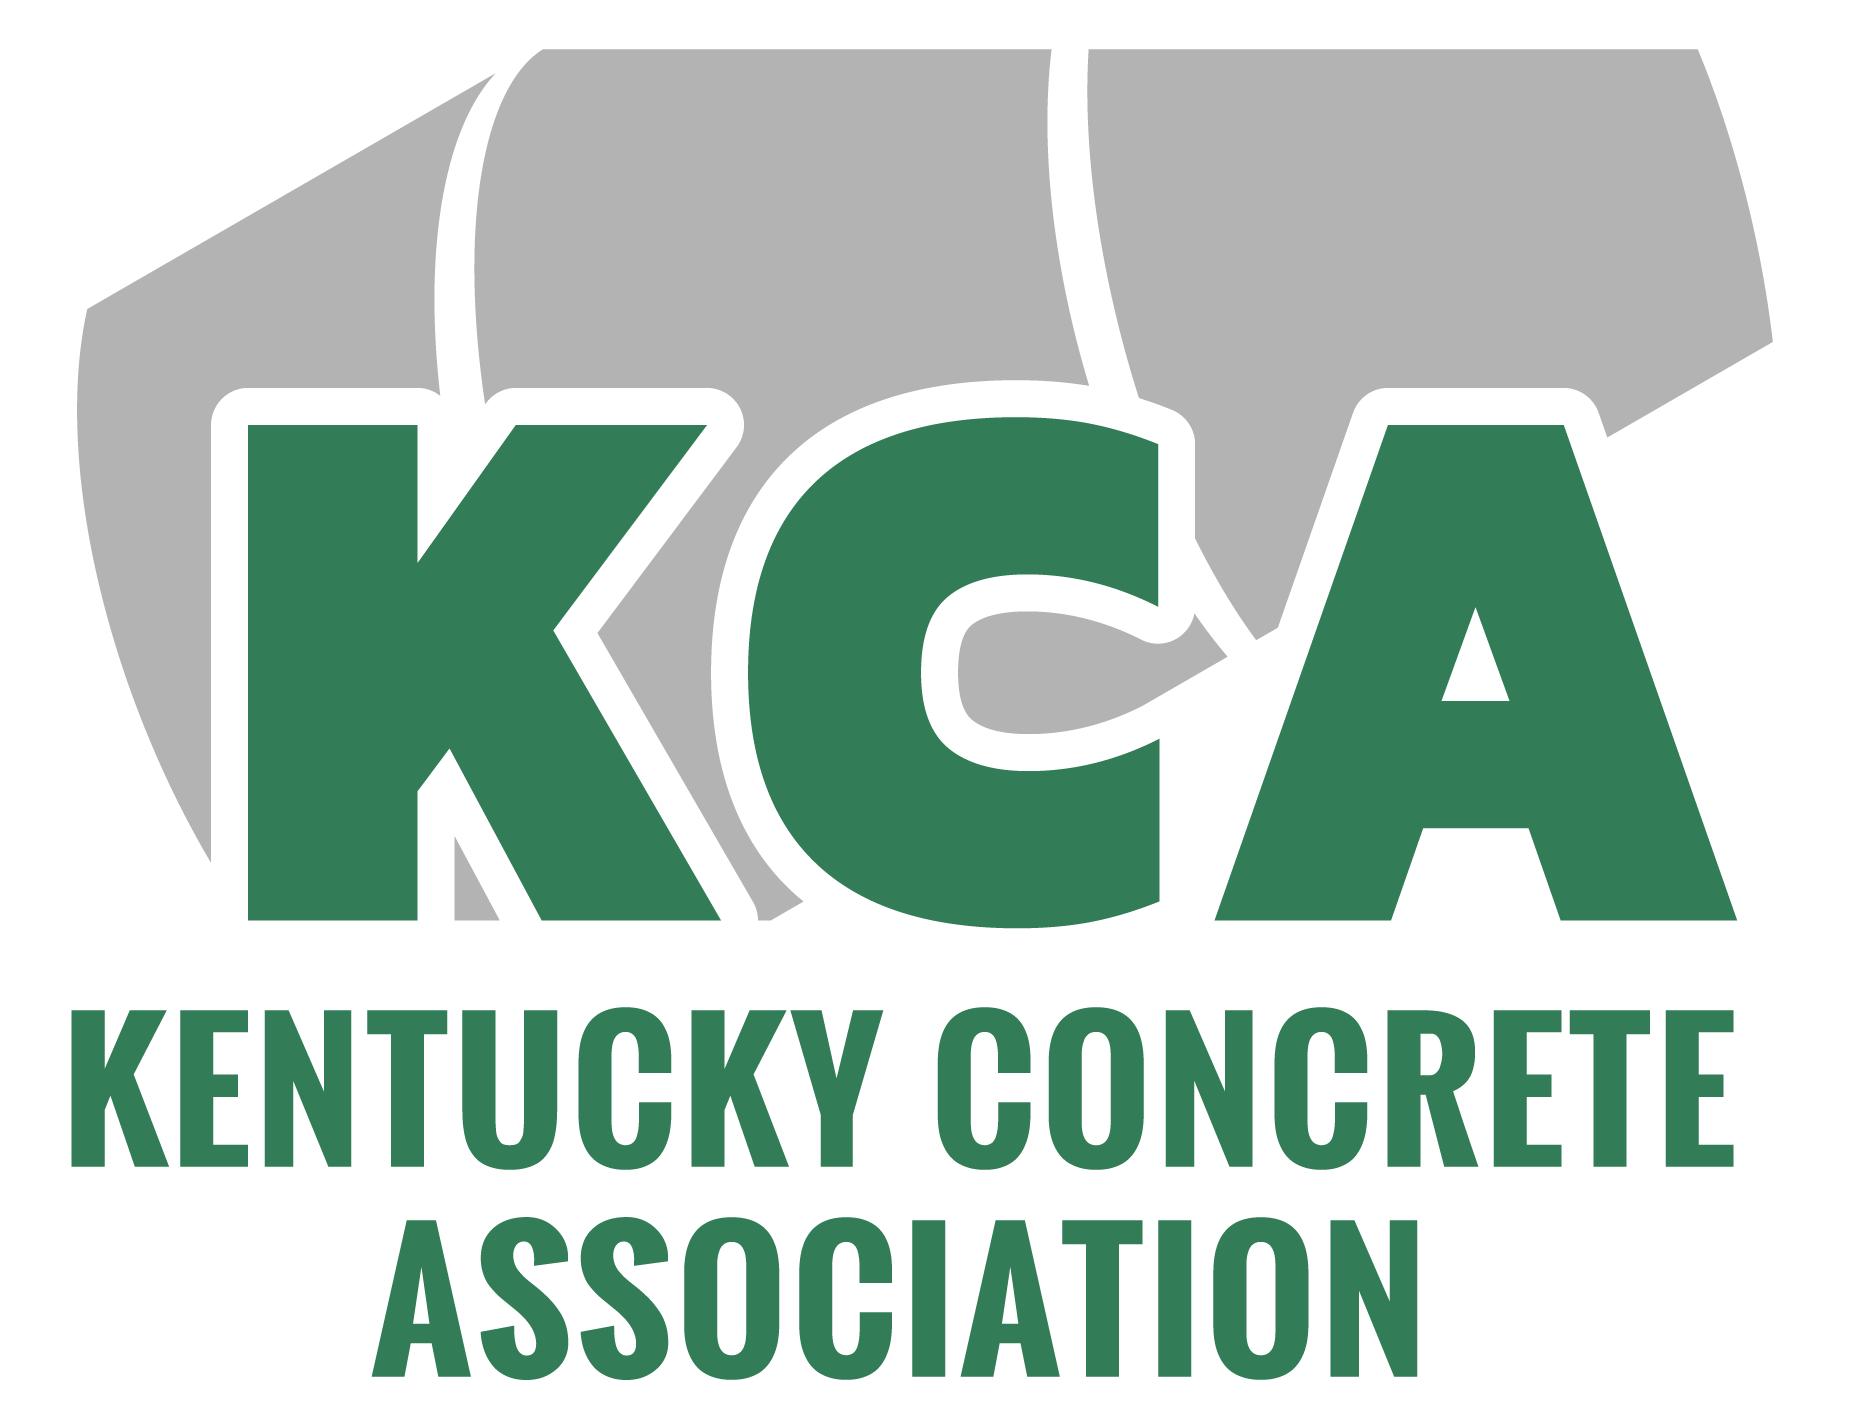 Kentucky Concrete Association